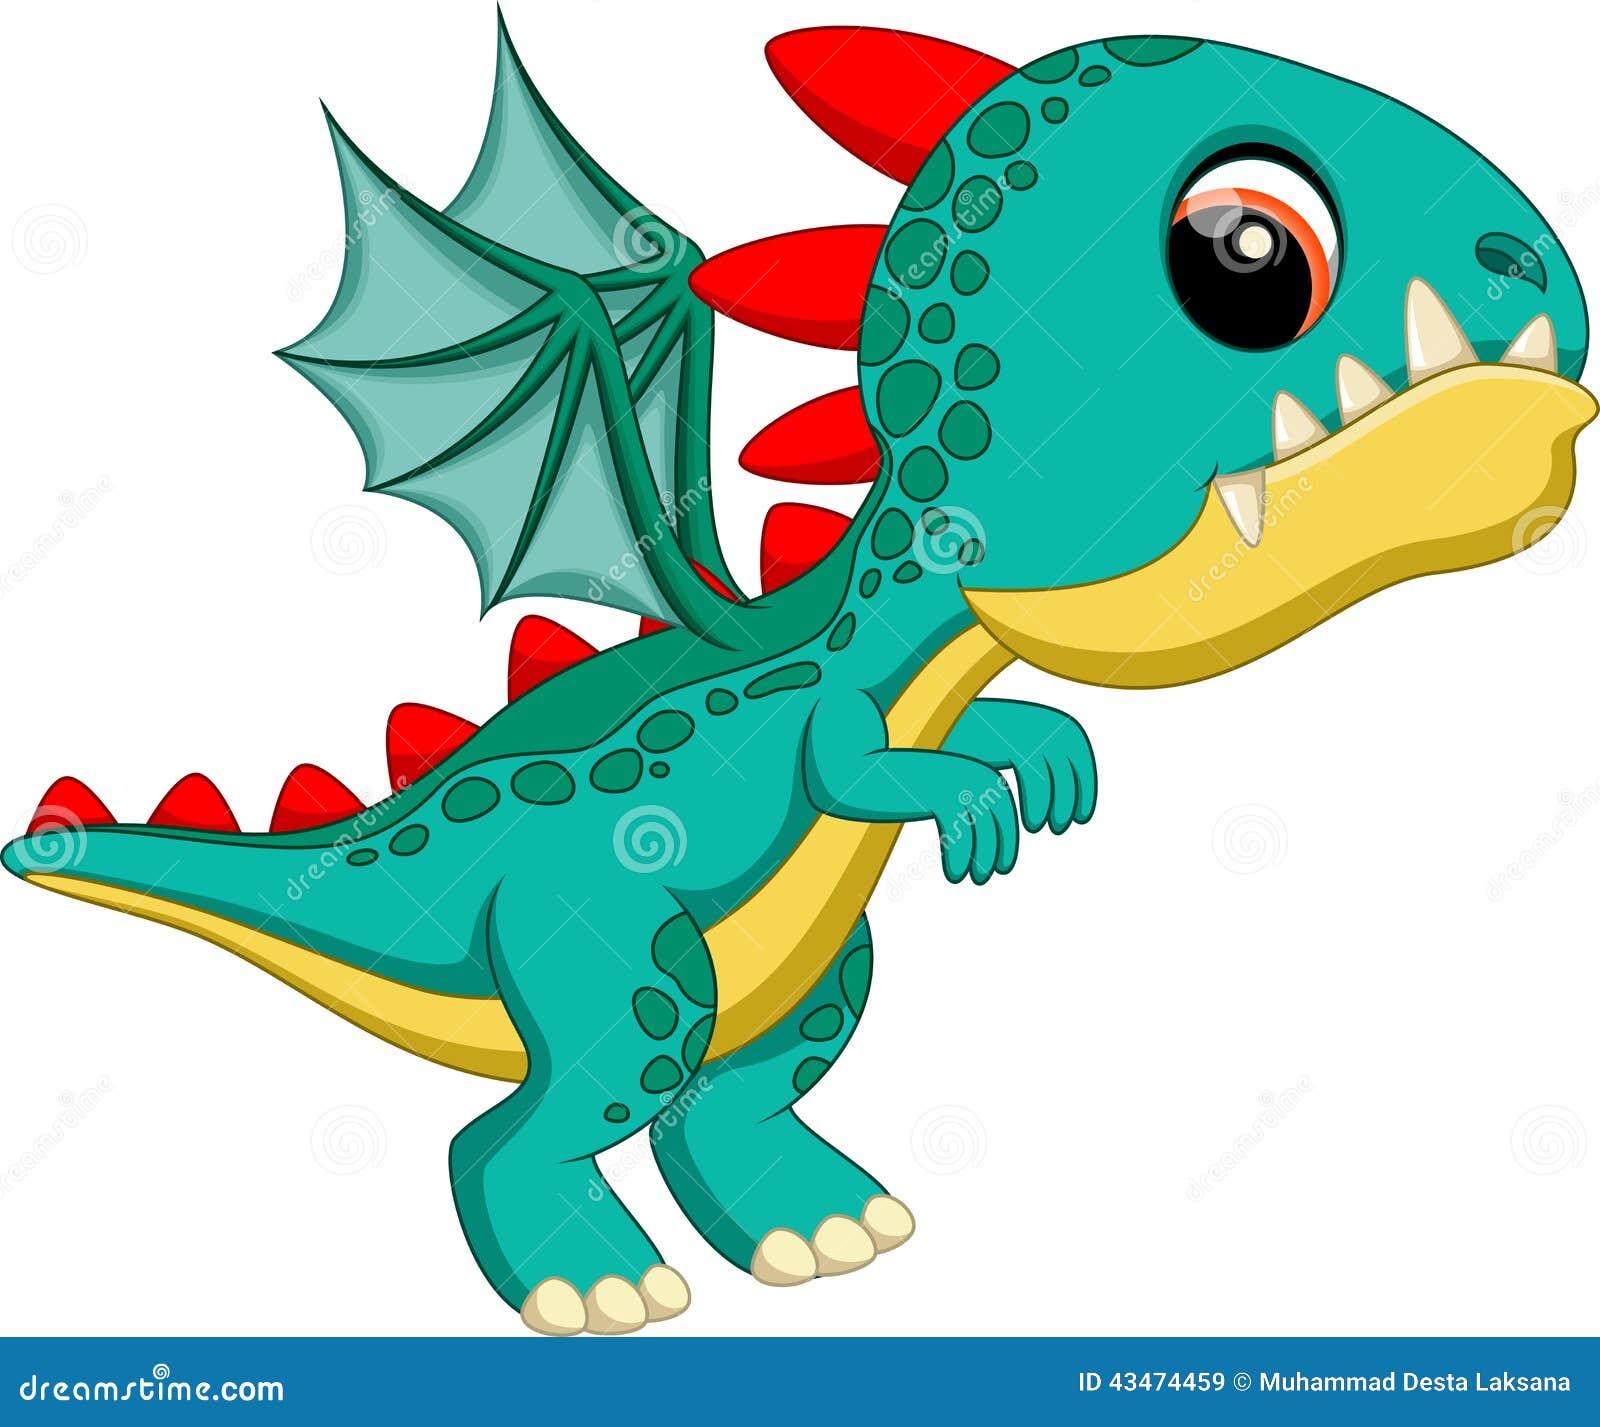 Cute baby dragon cartoon stock illustration image of creature cute baby dragon cartoon voltagebd Images